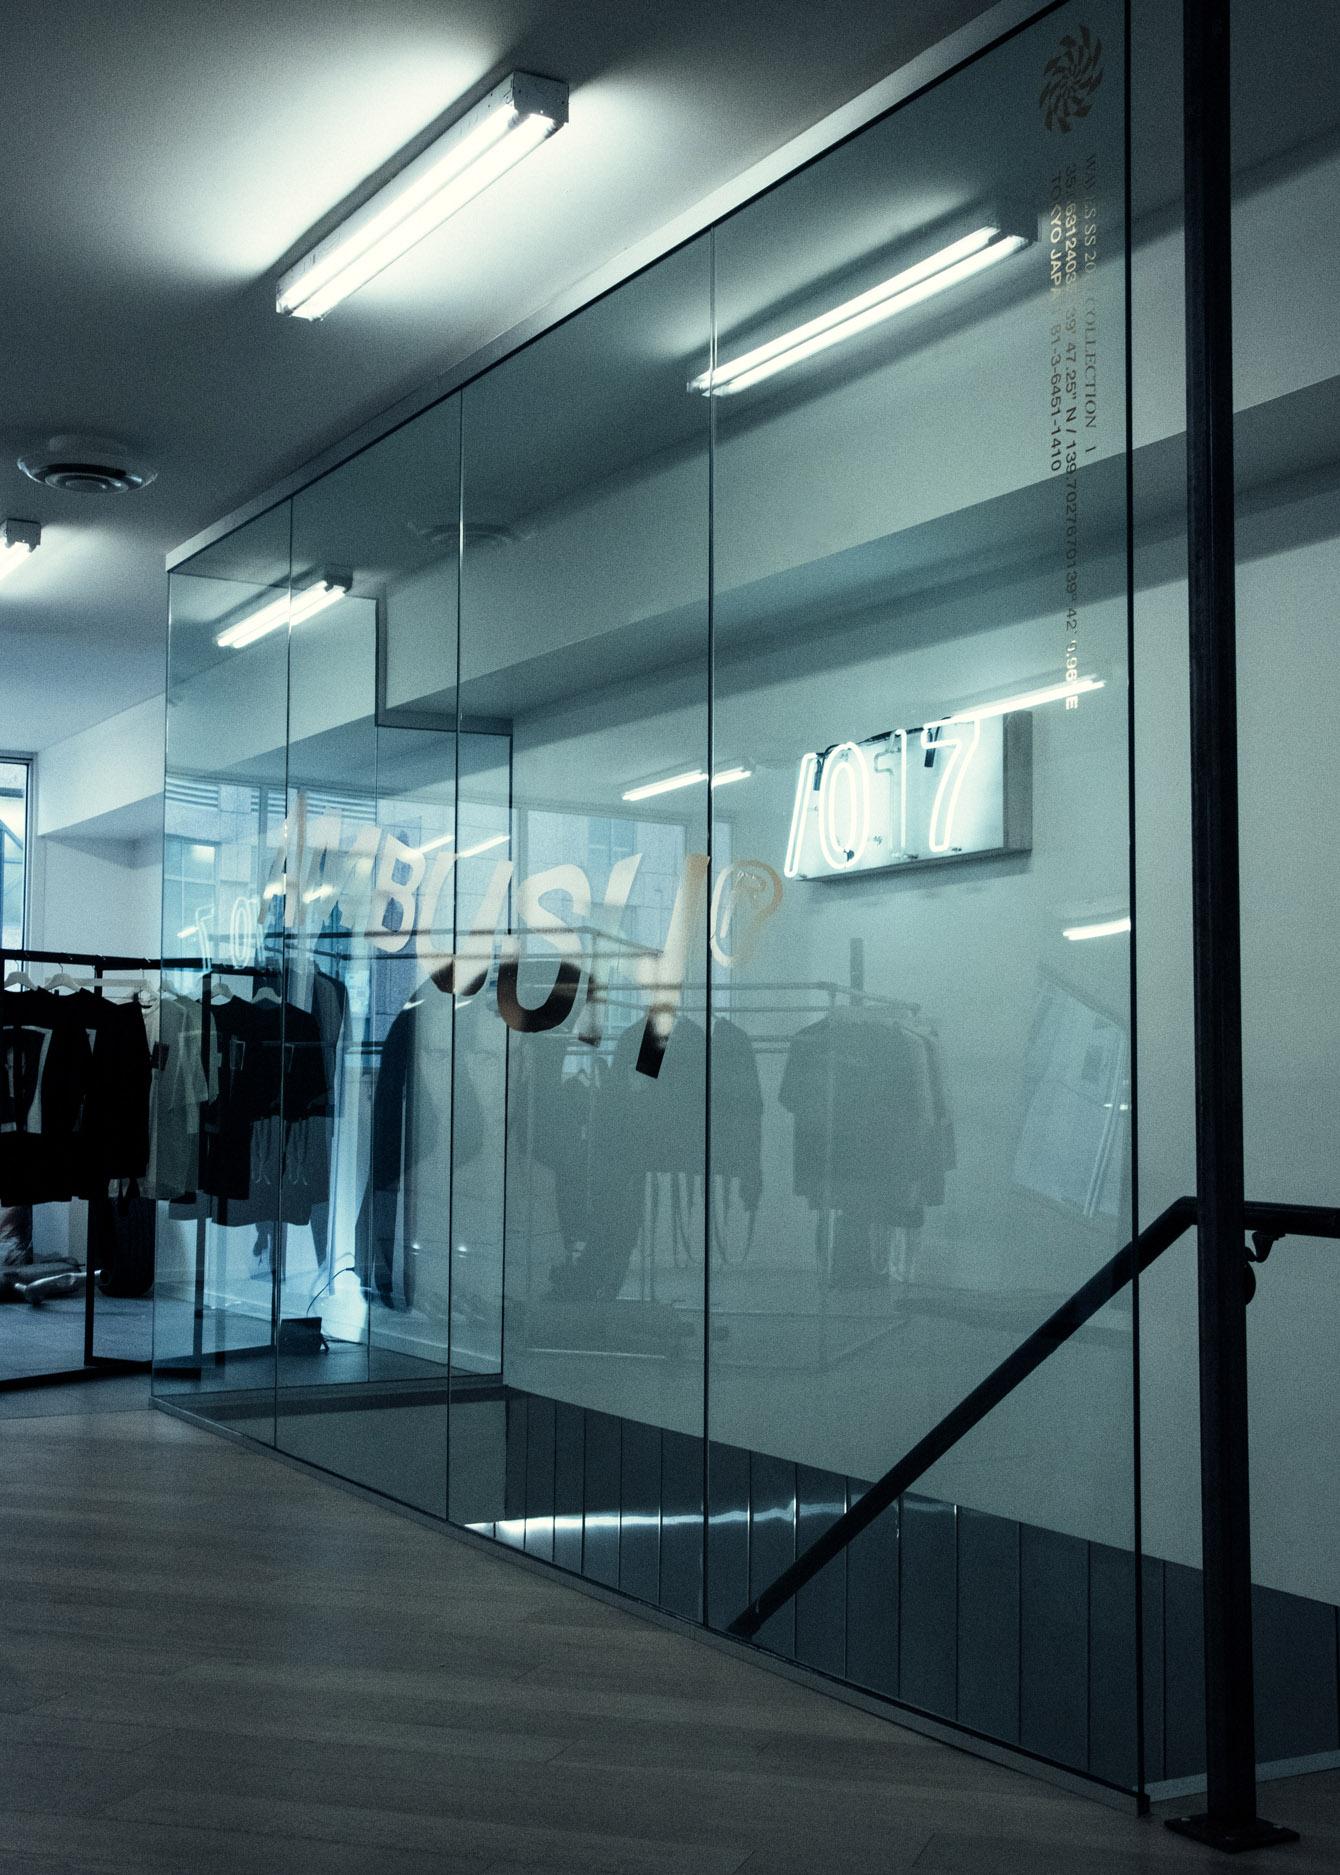 017 inside store